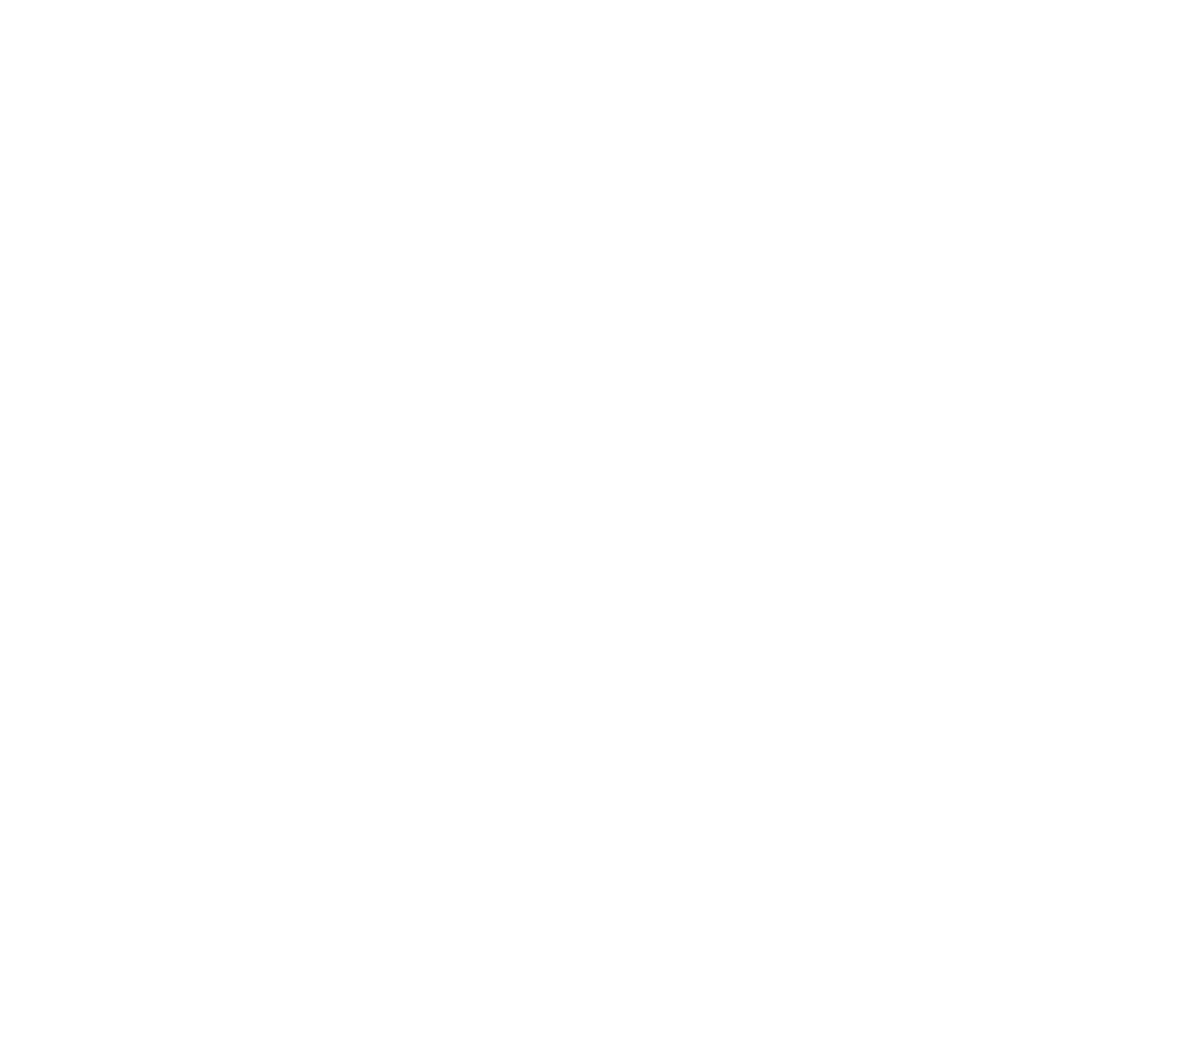 an icon of a fax machine